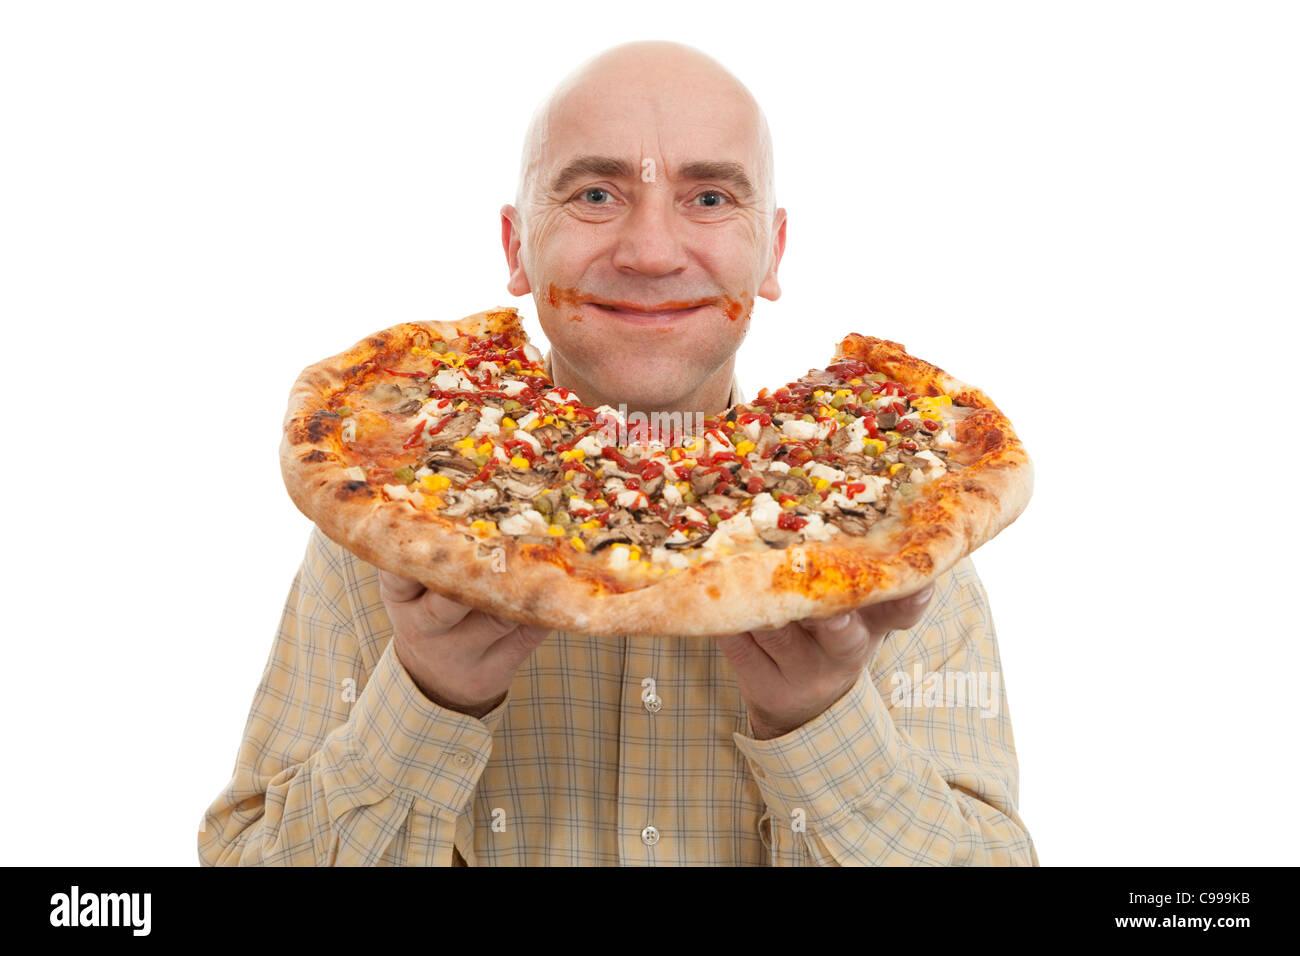 Glutton manger pizza big sur fond blanc Photo Stock